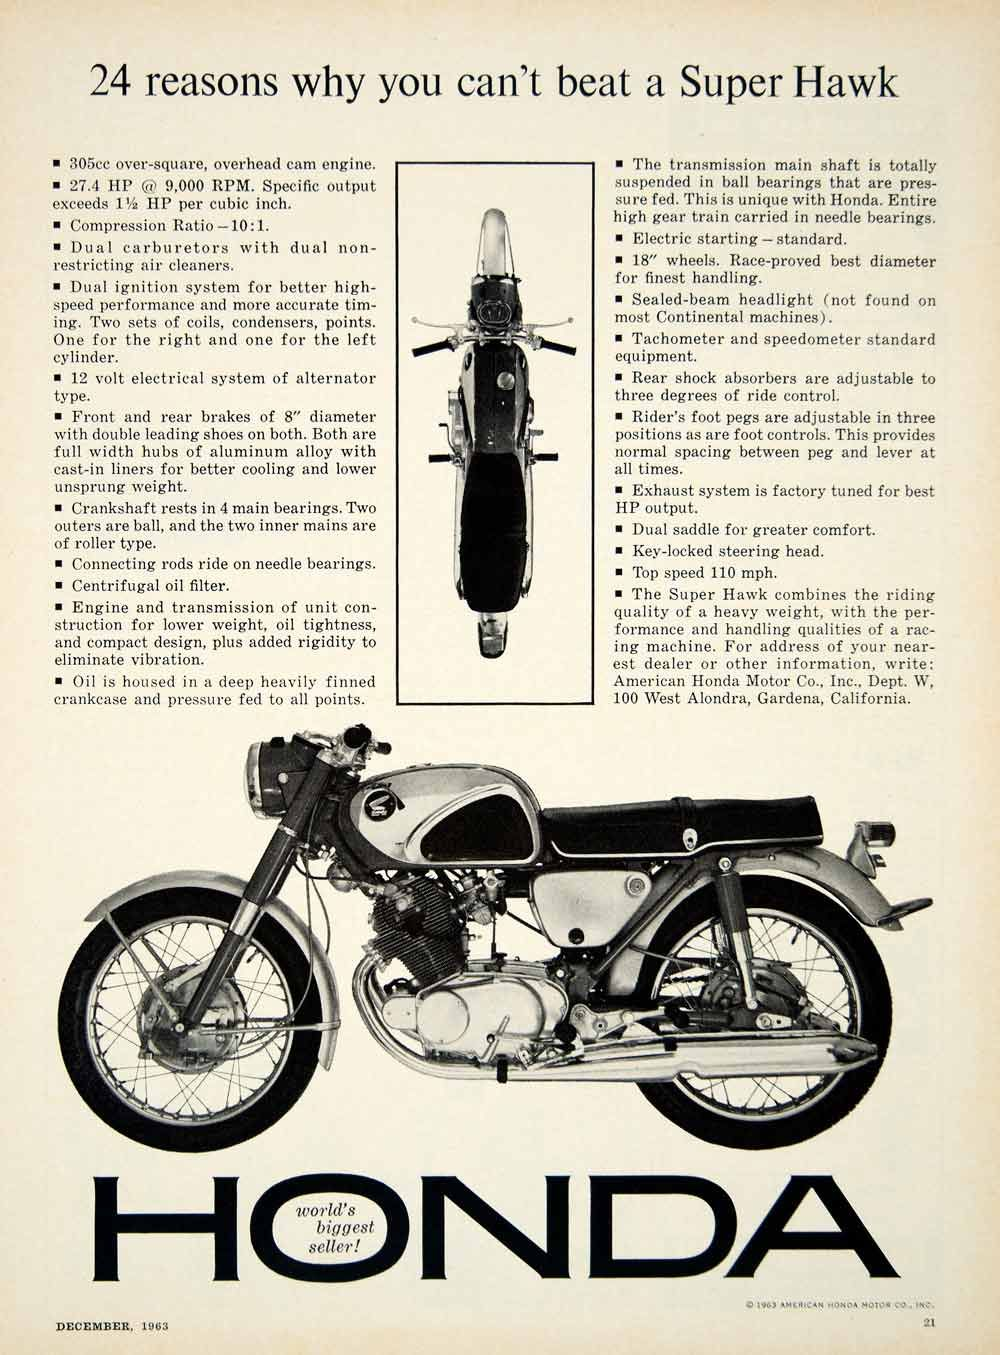 1963 Ad 1964 Honda Super Hawk CB77 Motorcycle 305cc OHC Twin Engine Sport Bike Vintage Superhawk